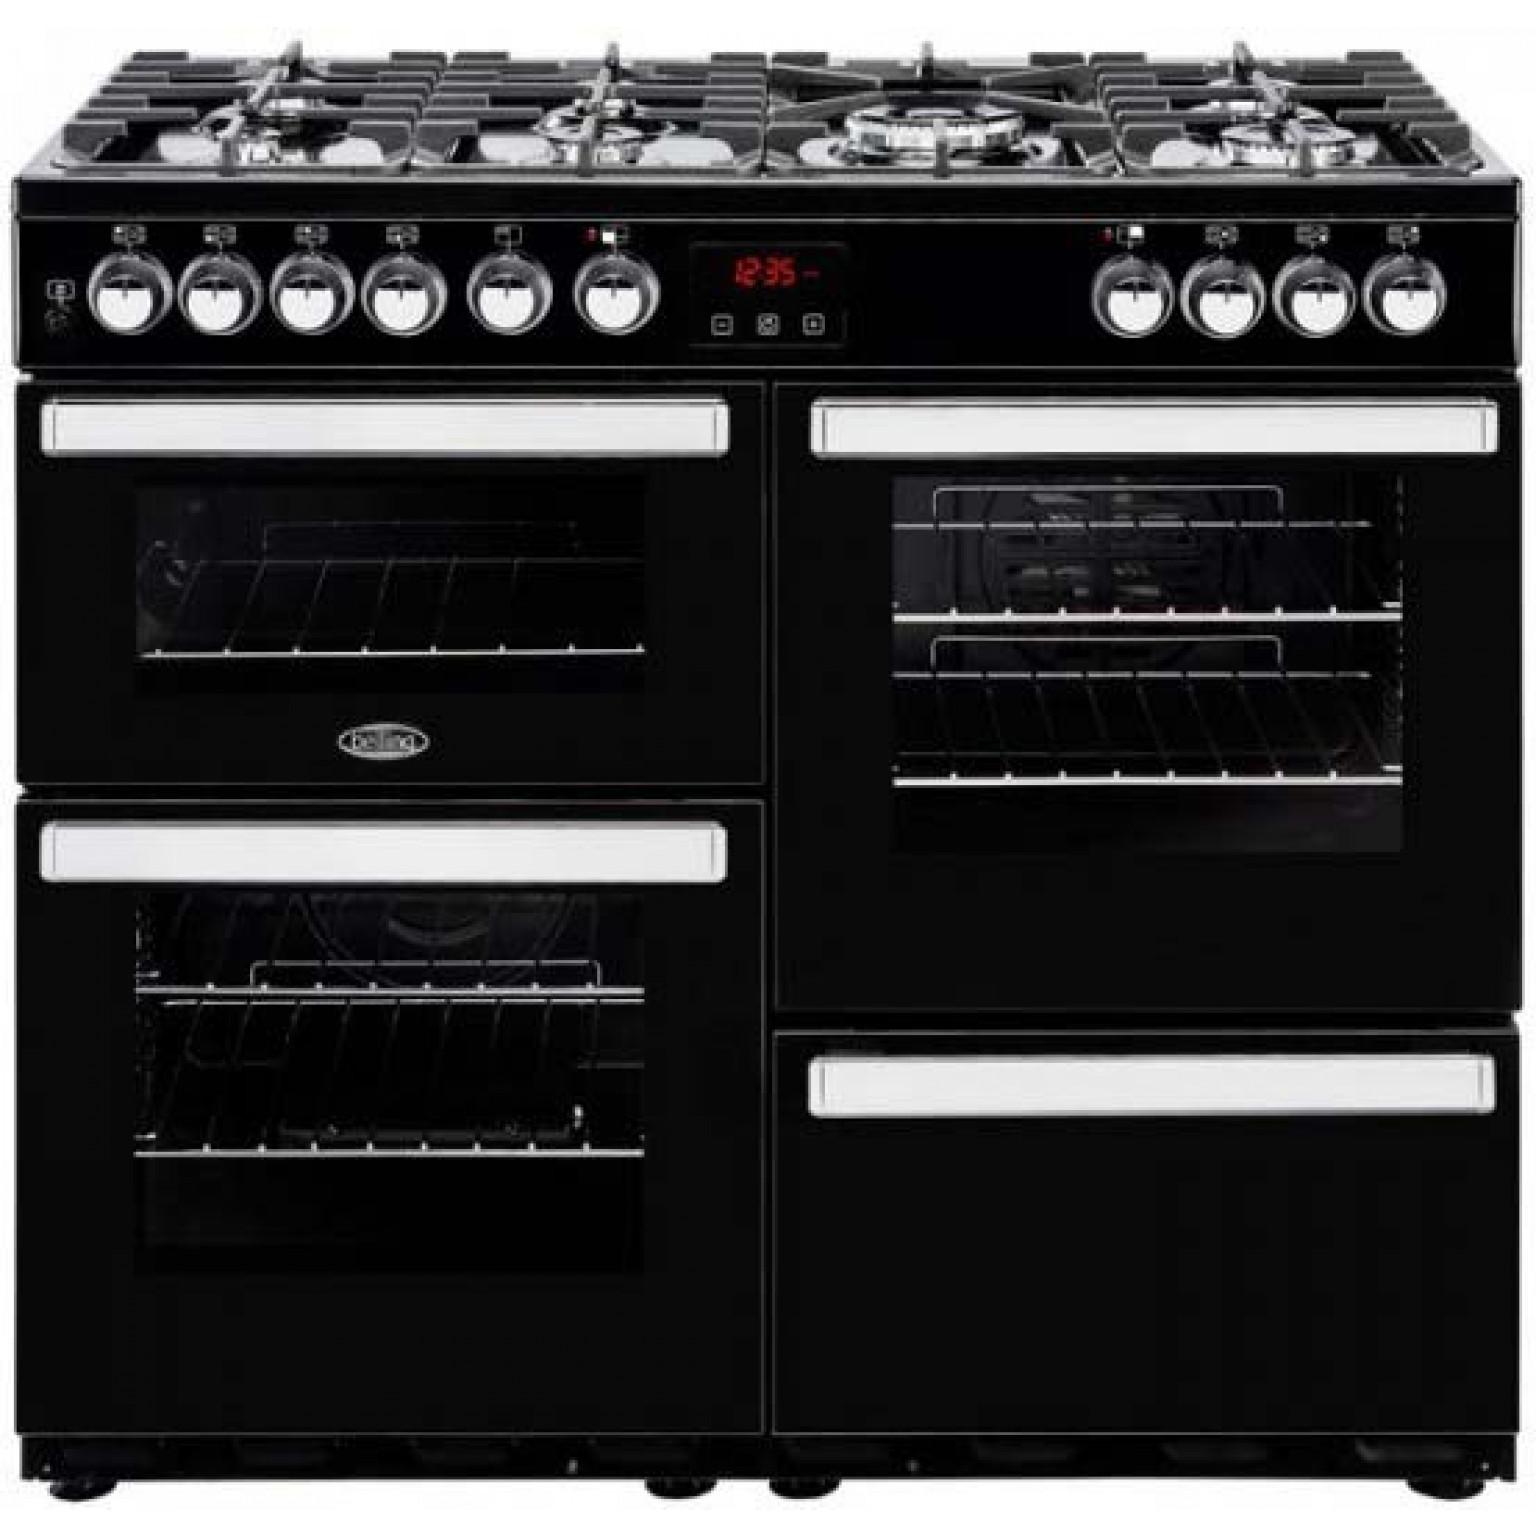 Belling Cookcentre 100cm Dual Fuel Range Cooker 100DFTBLK